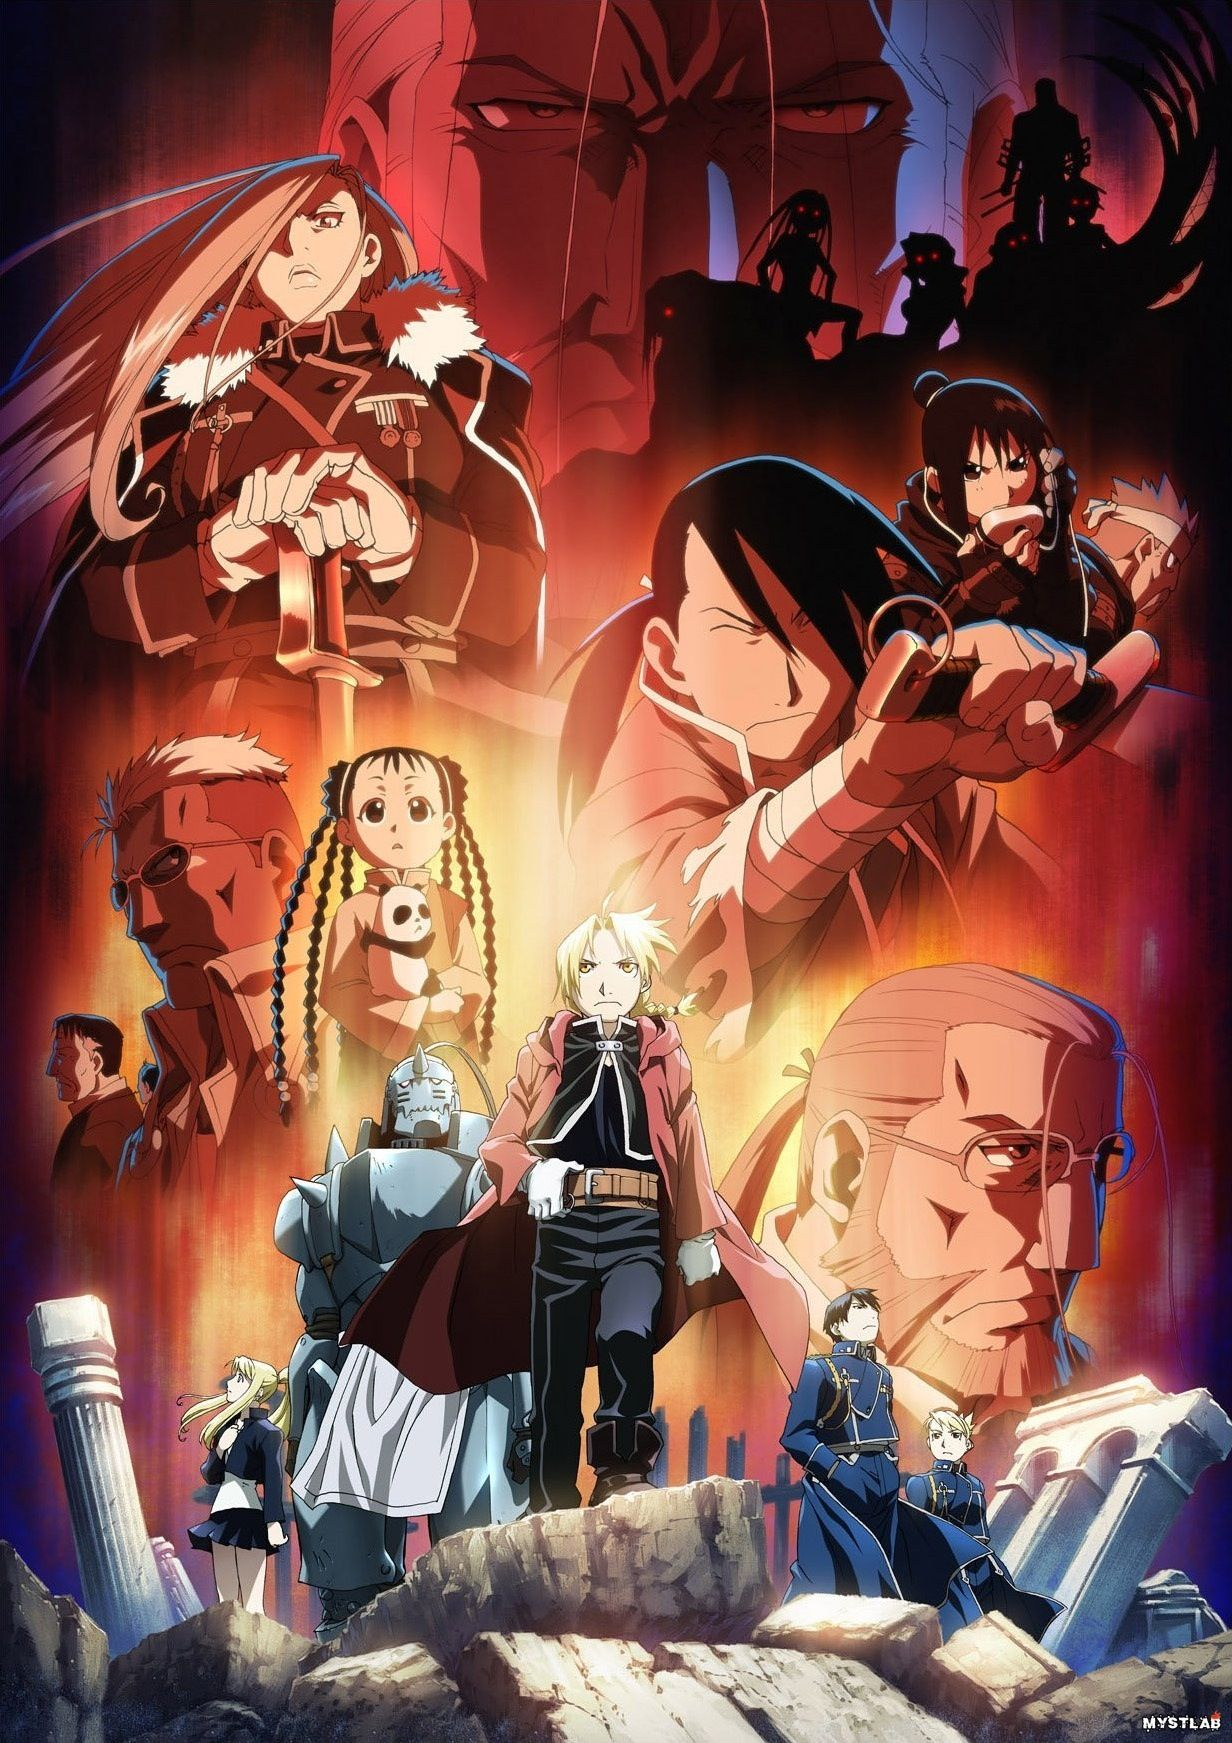 _Fullmetal Alchemist Brotherhood Fullmetal alchemist